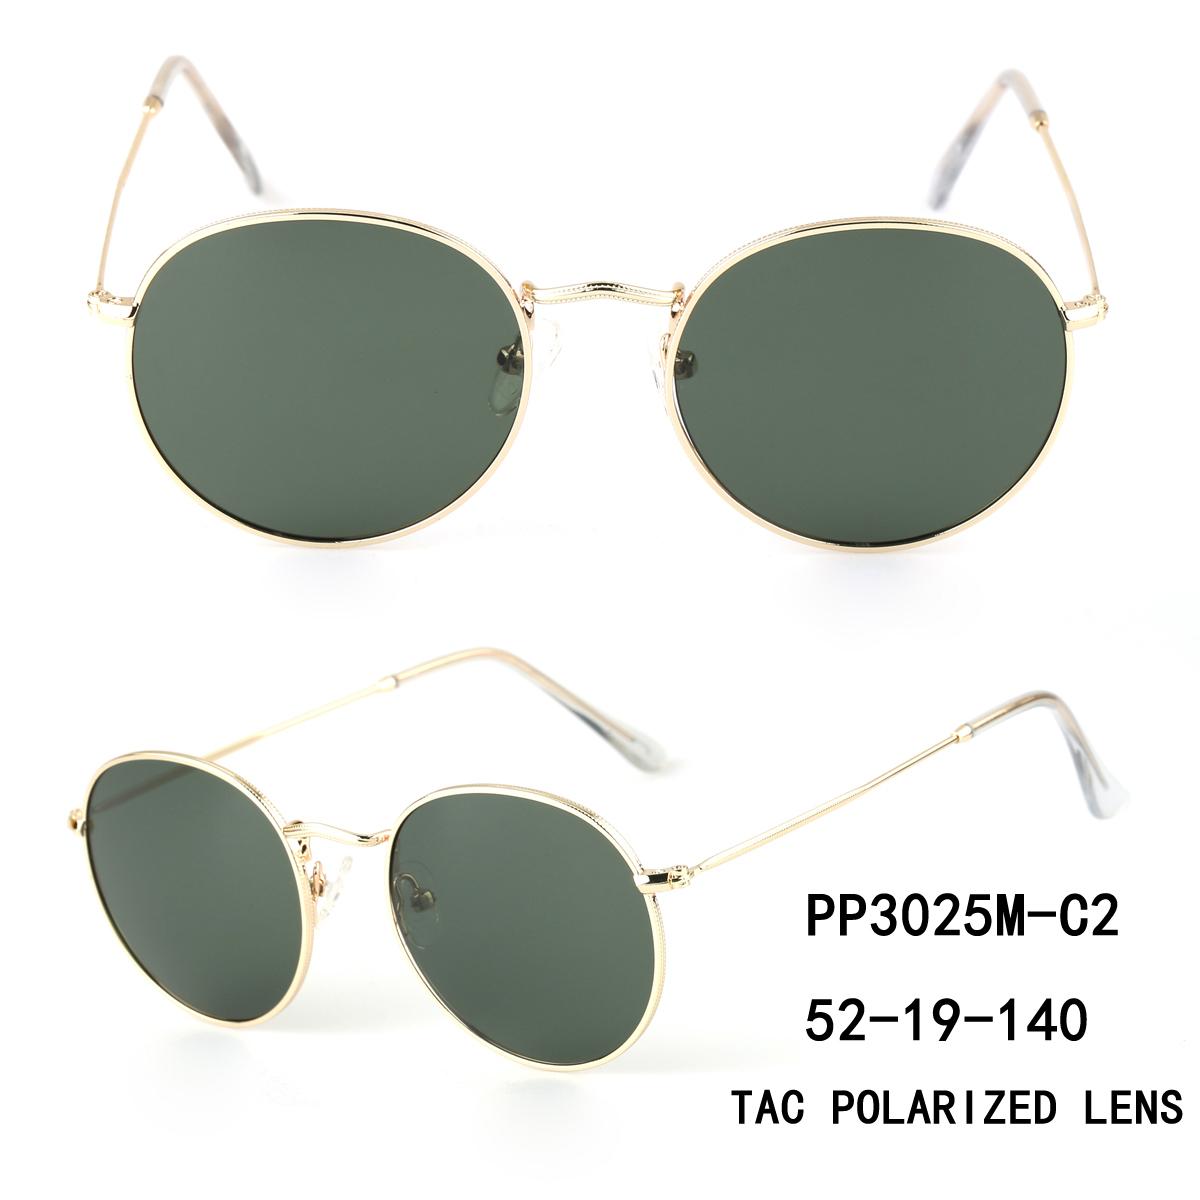 Round Polarized Metal Sunglasses Oem Odm Wholesale, Oversized Gold,Black,Blue Mirrored Metal Sunglasses